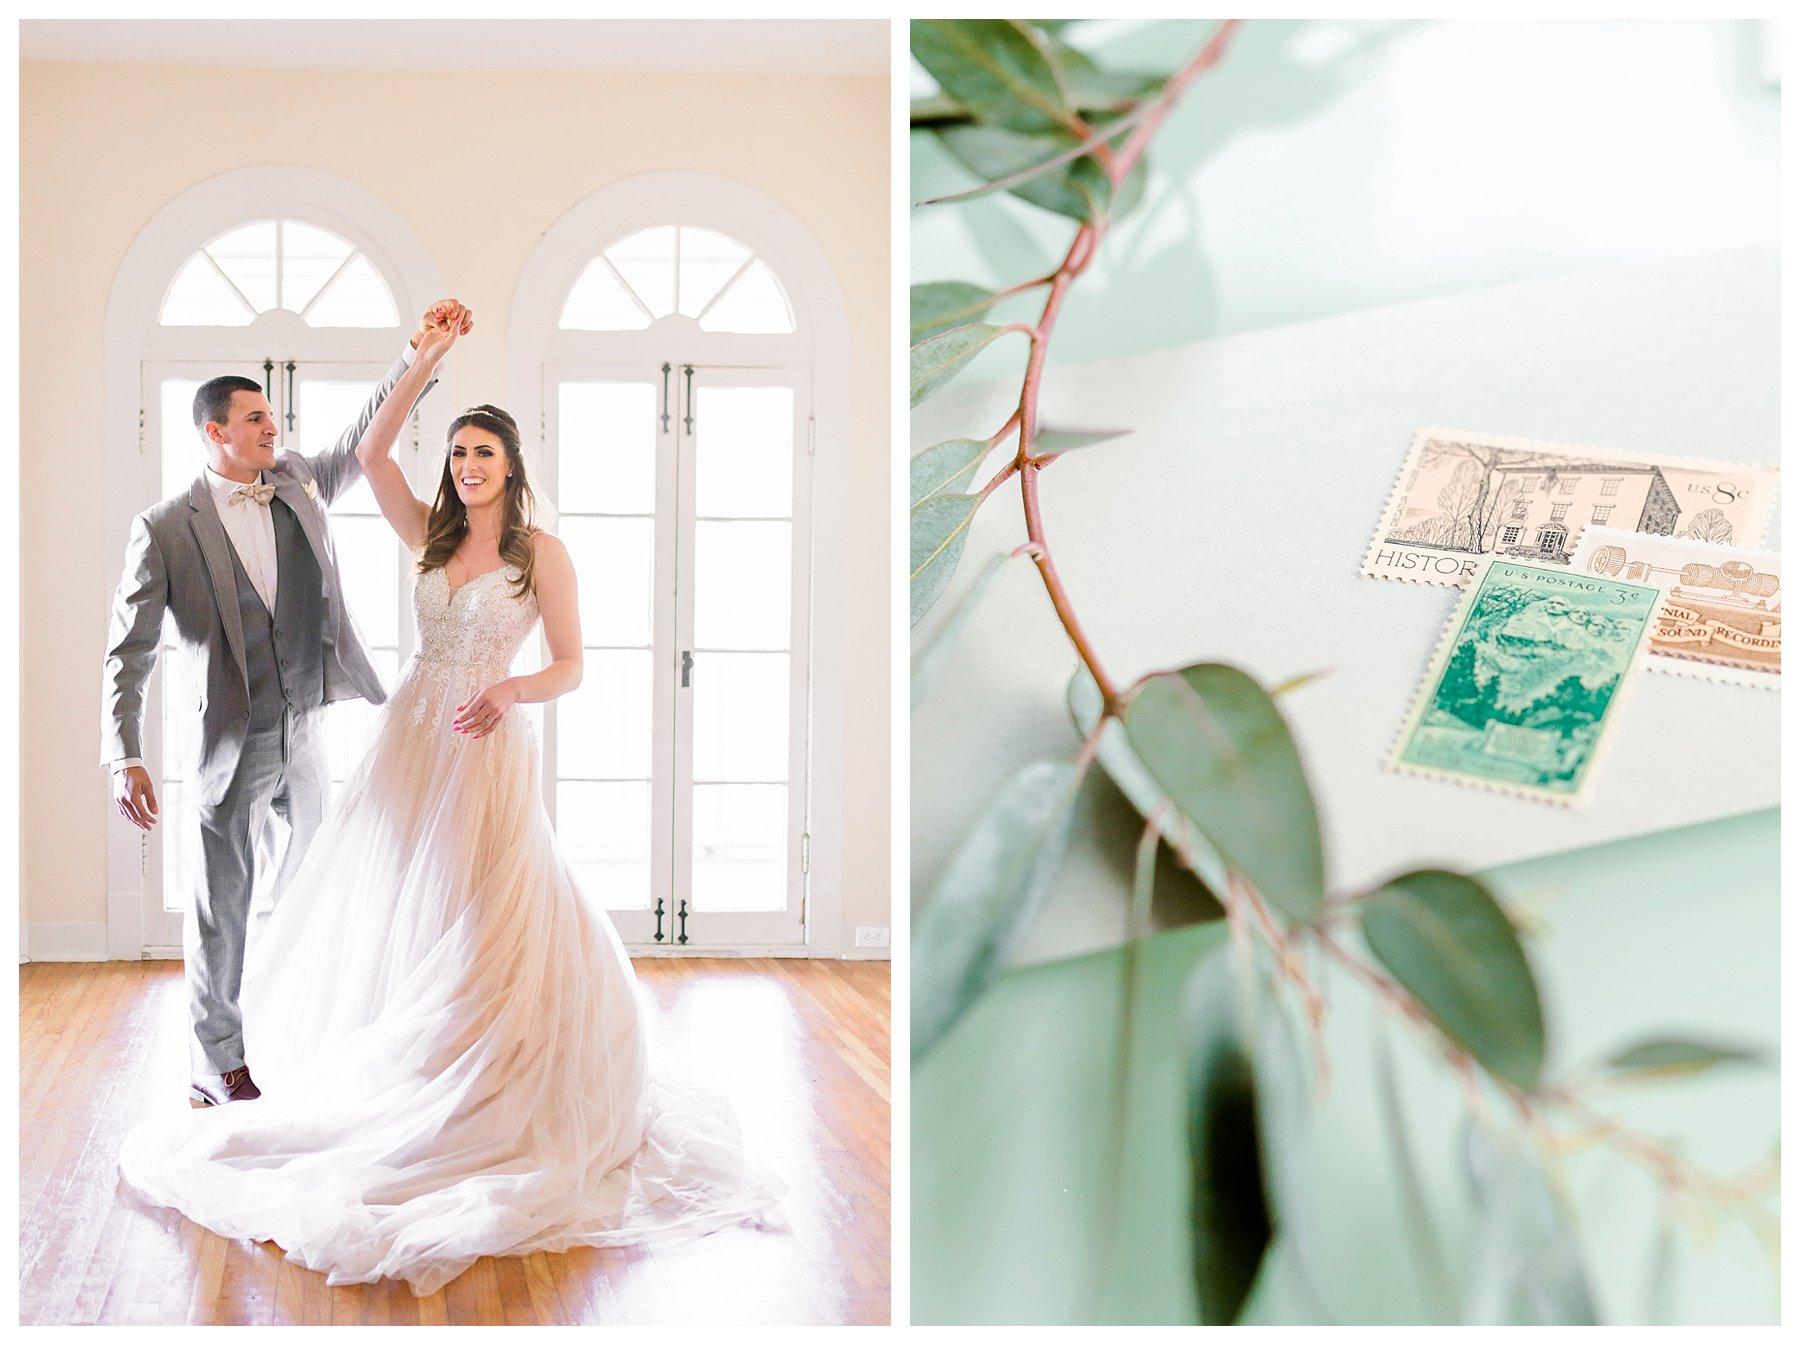 photographer_wedding_saint_louis_Kansas_City_Photography_Videography_workshop_training_styled_engagement_Lake_Ozark_KC_MO_STL_Rolla_Hermann_Saint_James_0388.jpg